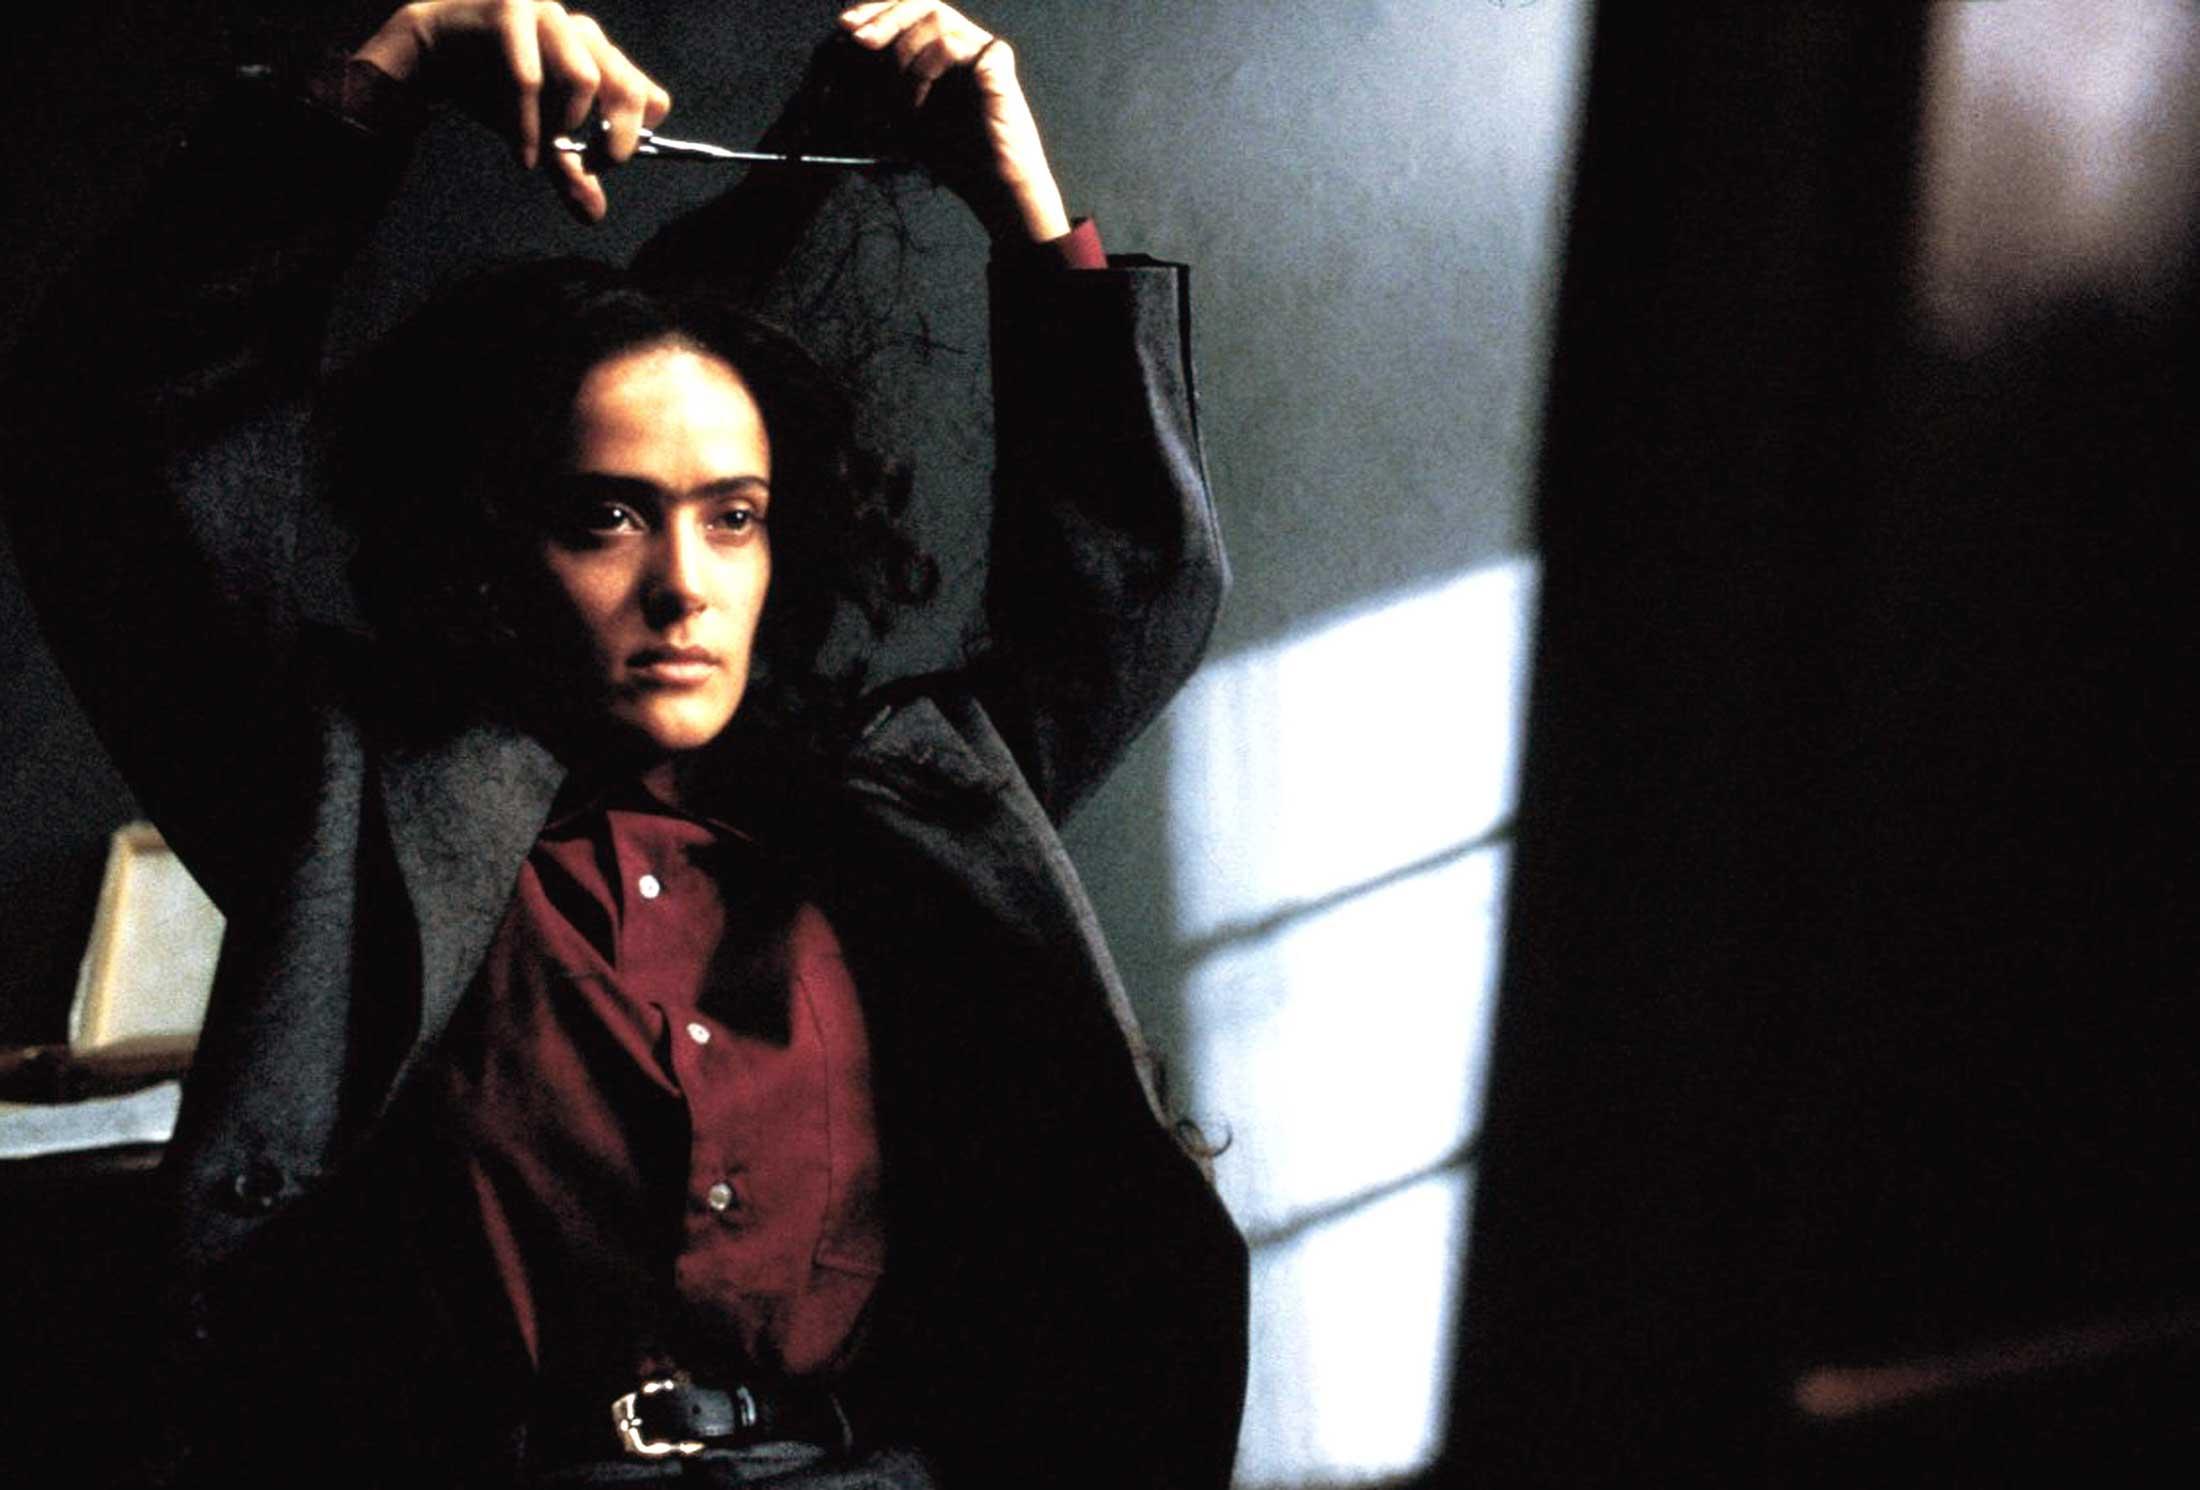 Frida, Miramax / Courtesy Everett Collection. <br/> Between swigs of liquor, Frida Kahlo (Salma Hayek) impulsively cuts her hair in the 2002 eponymous film, Frida.